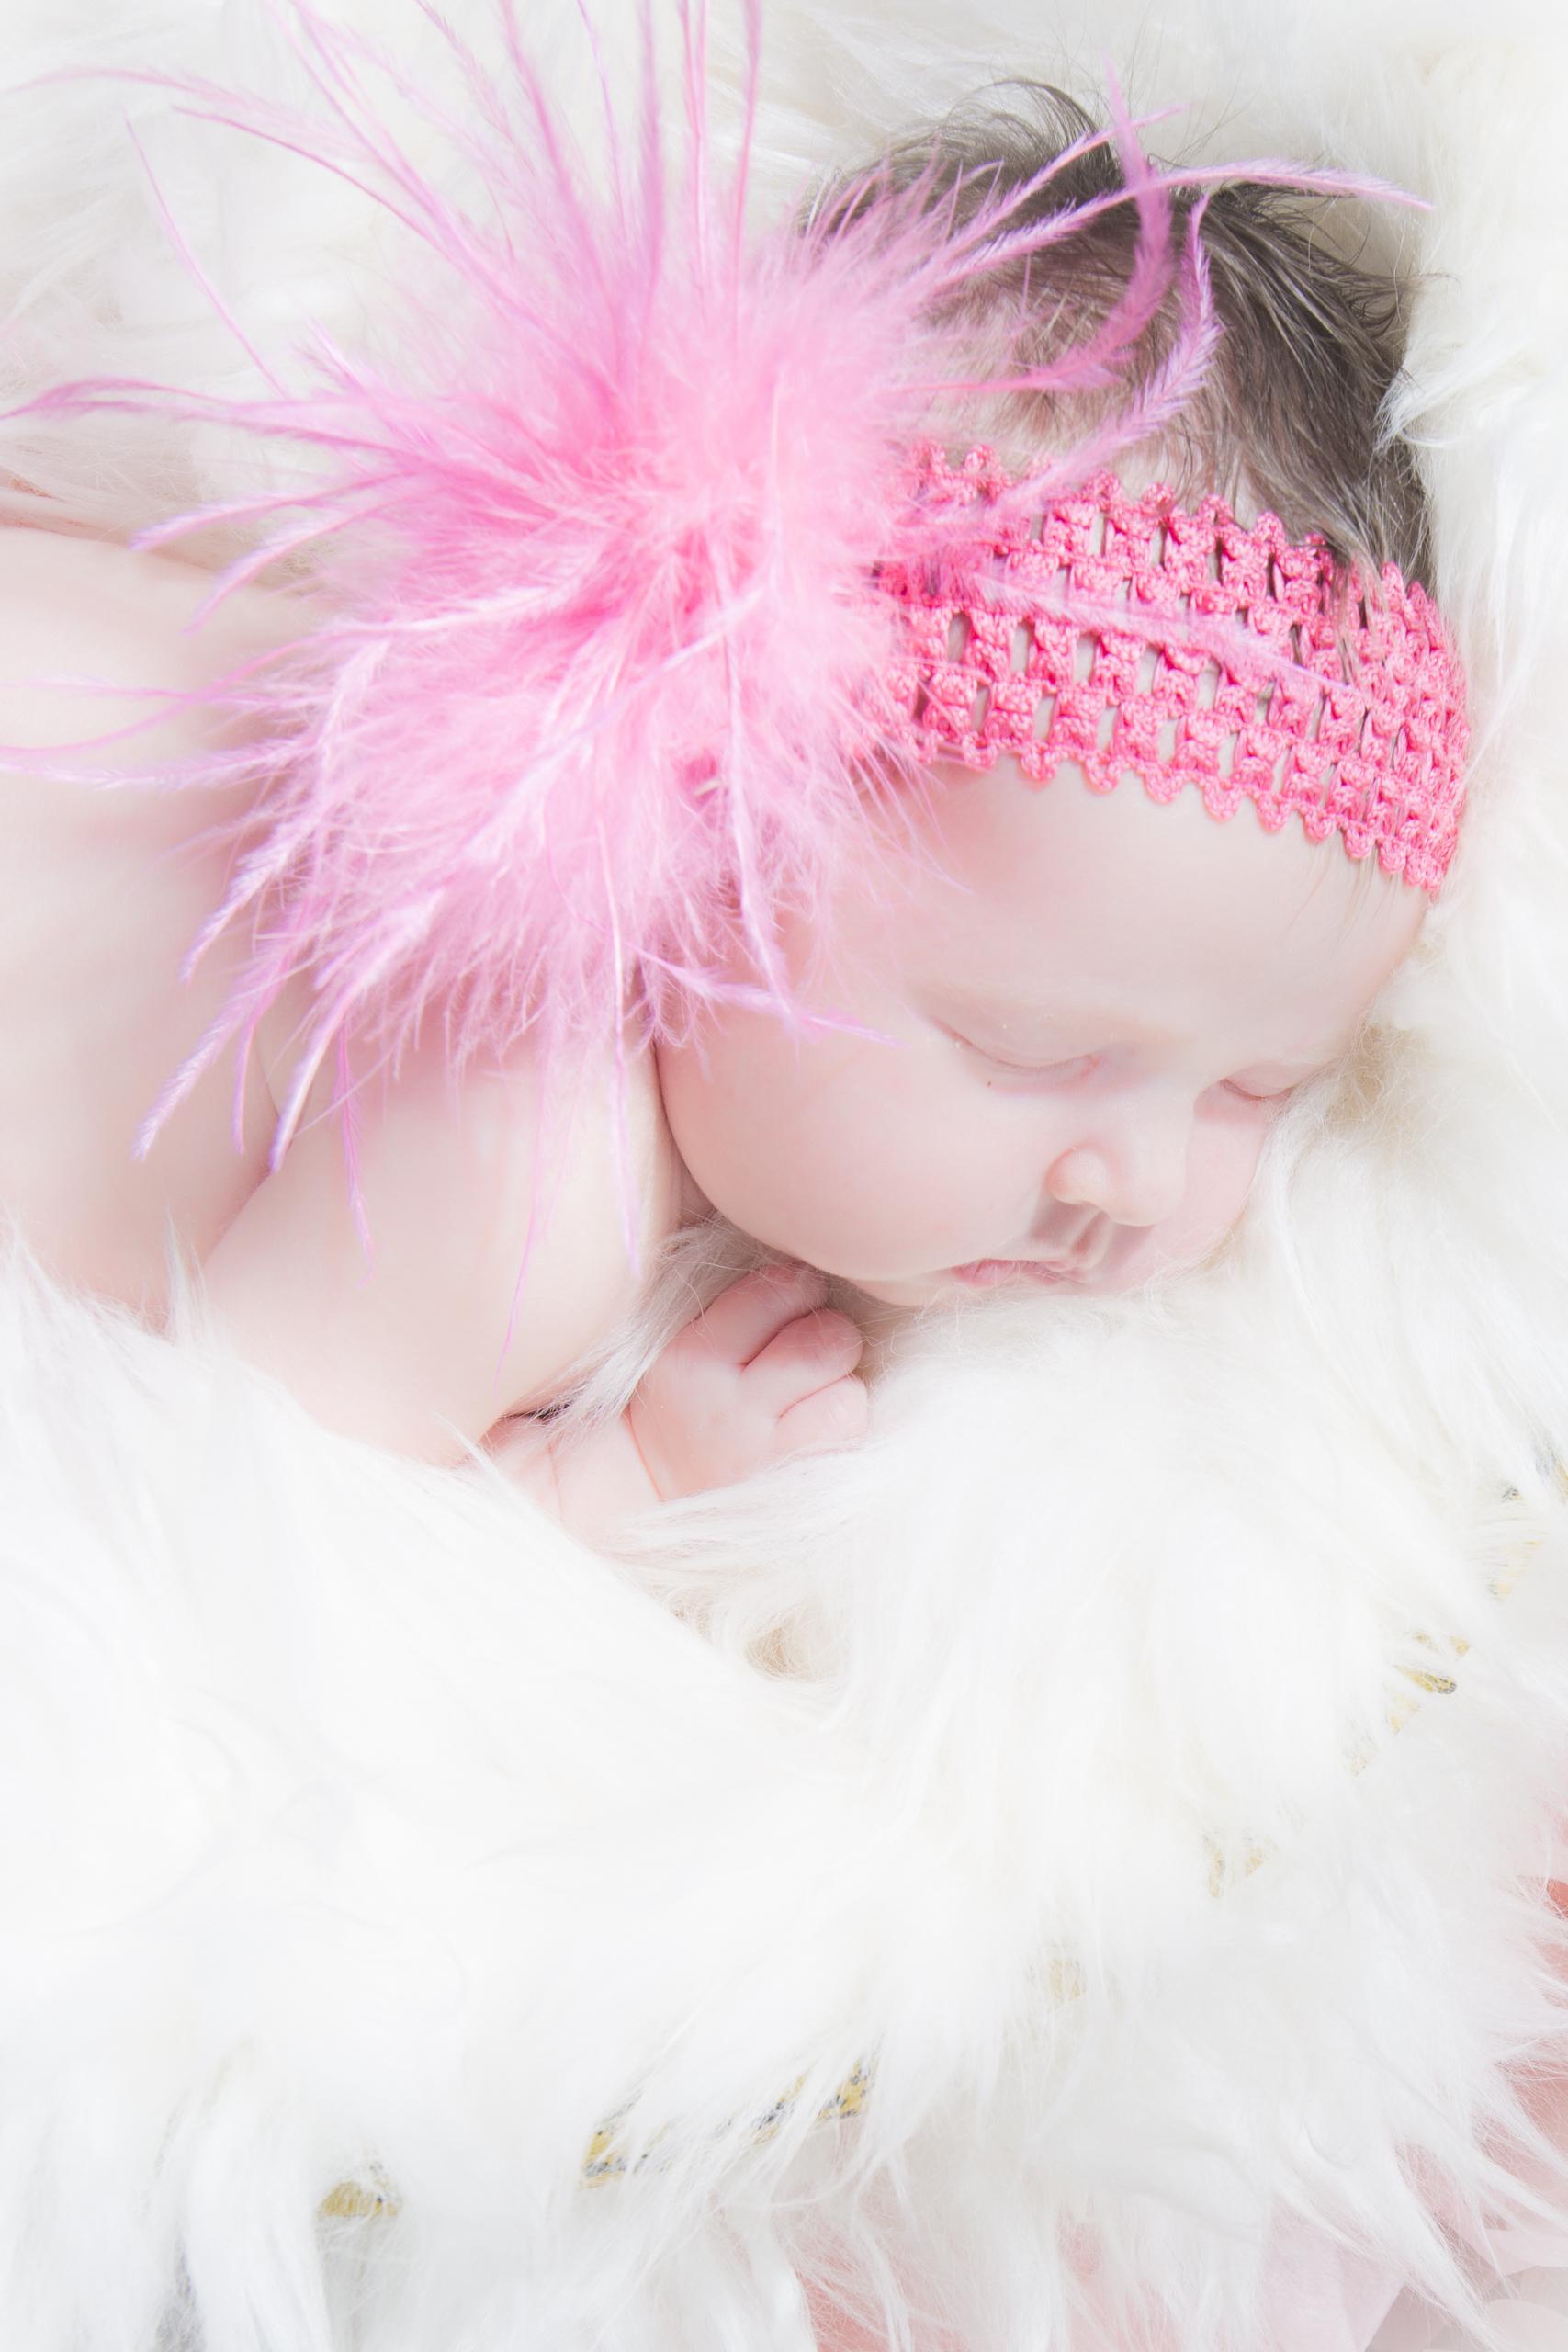 05 newborn girl pink feather headband fur rug basket studio photography session.jpg